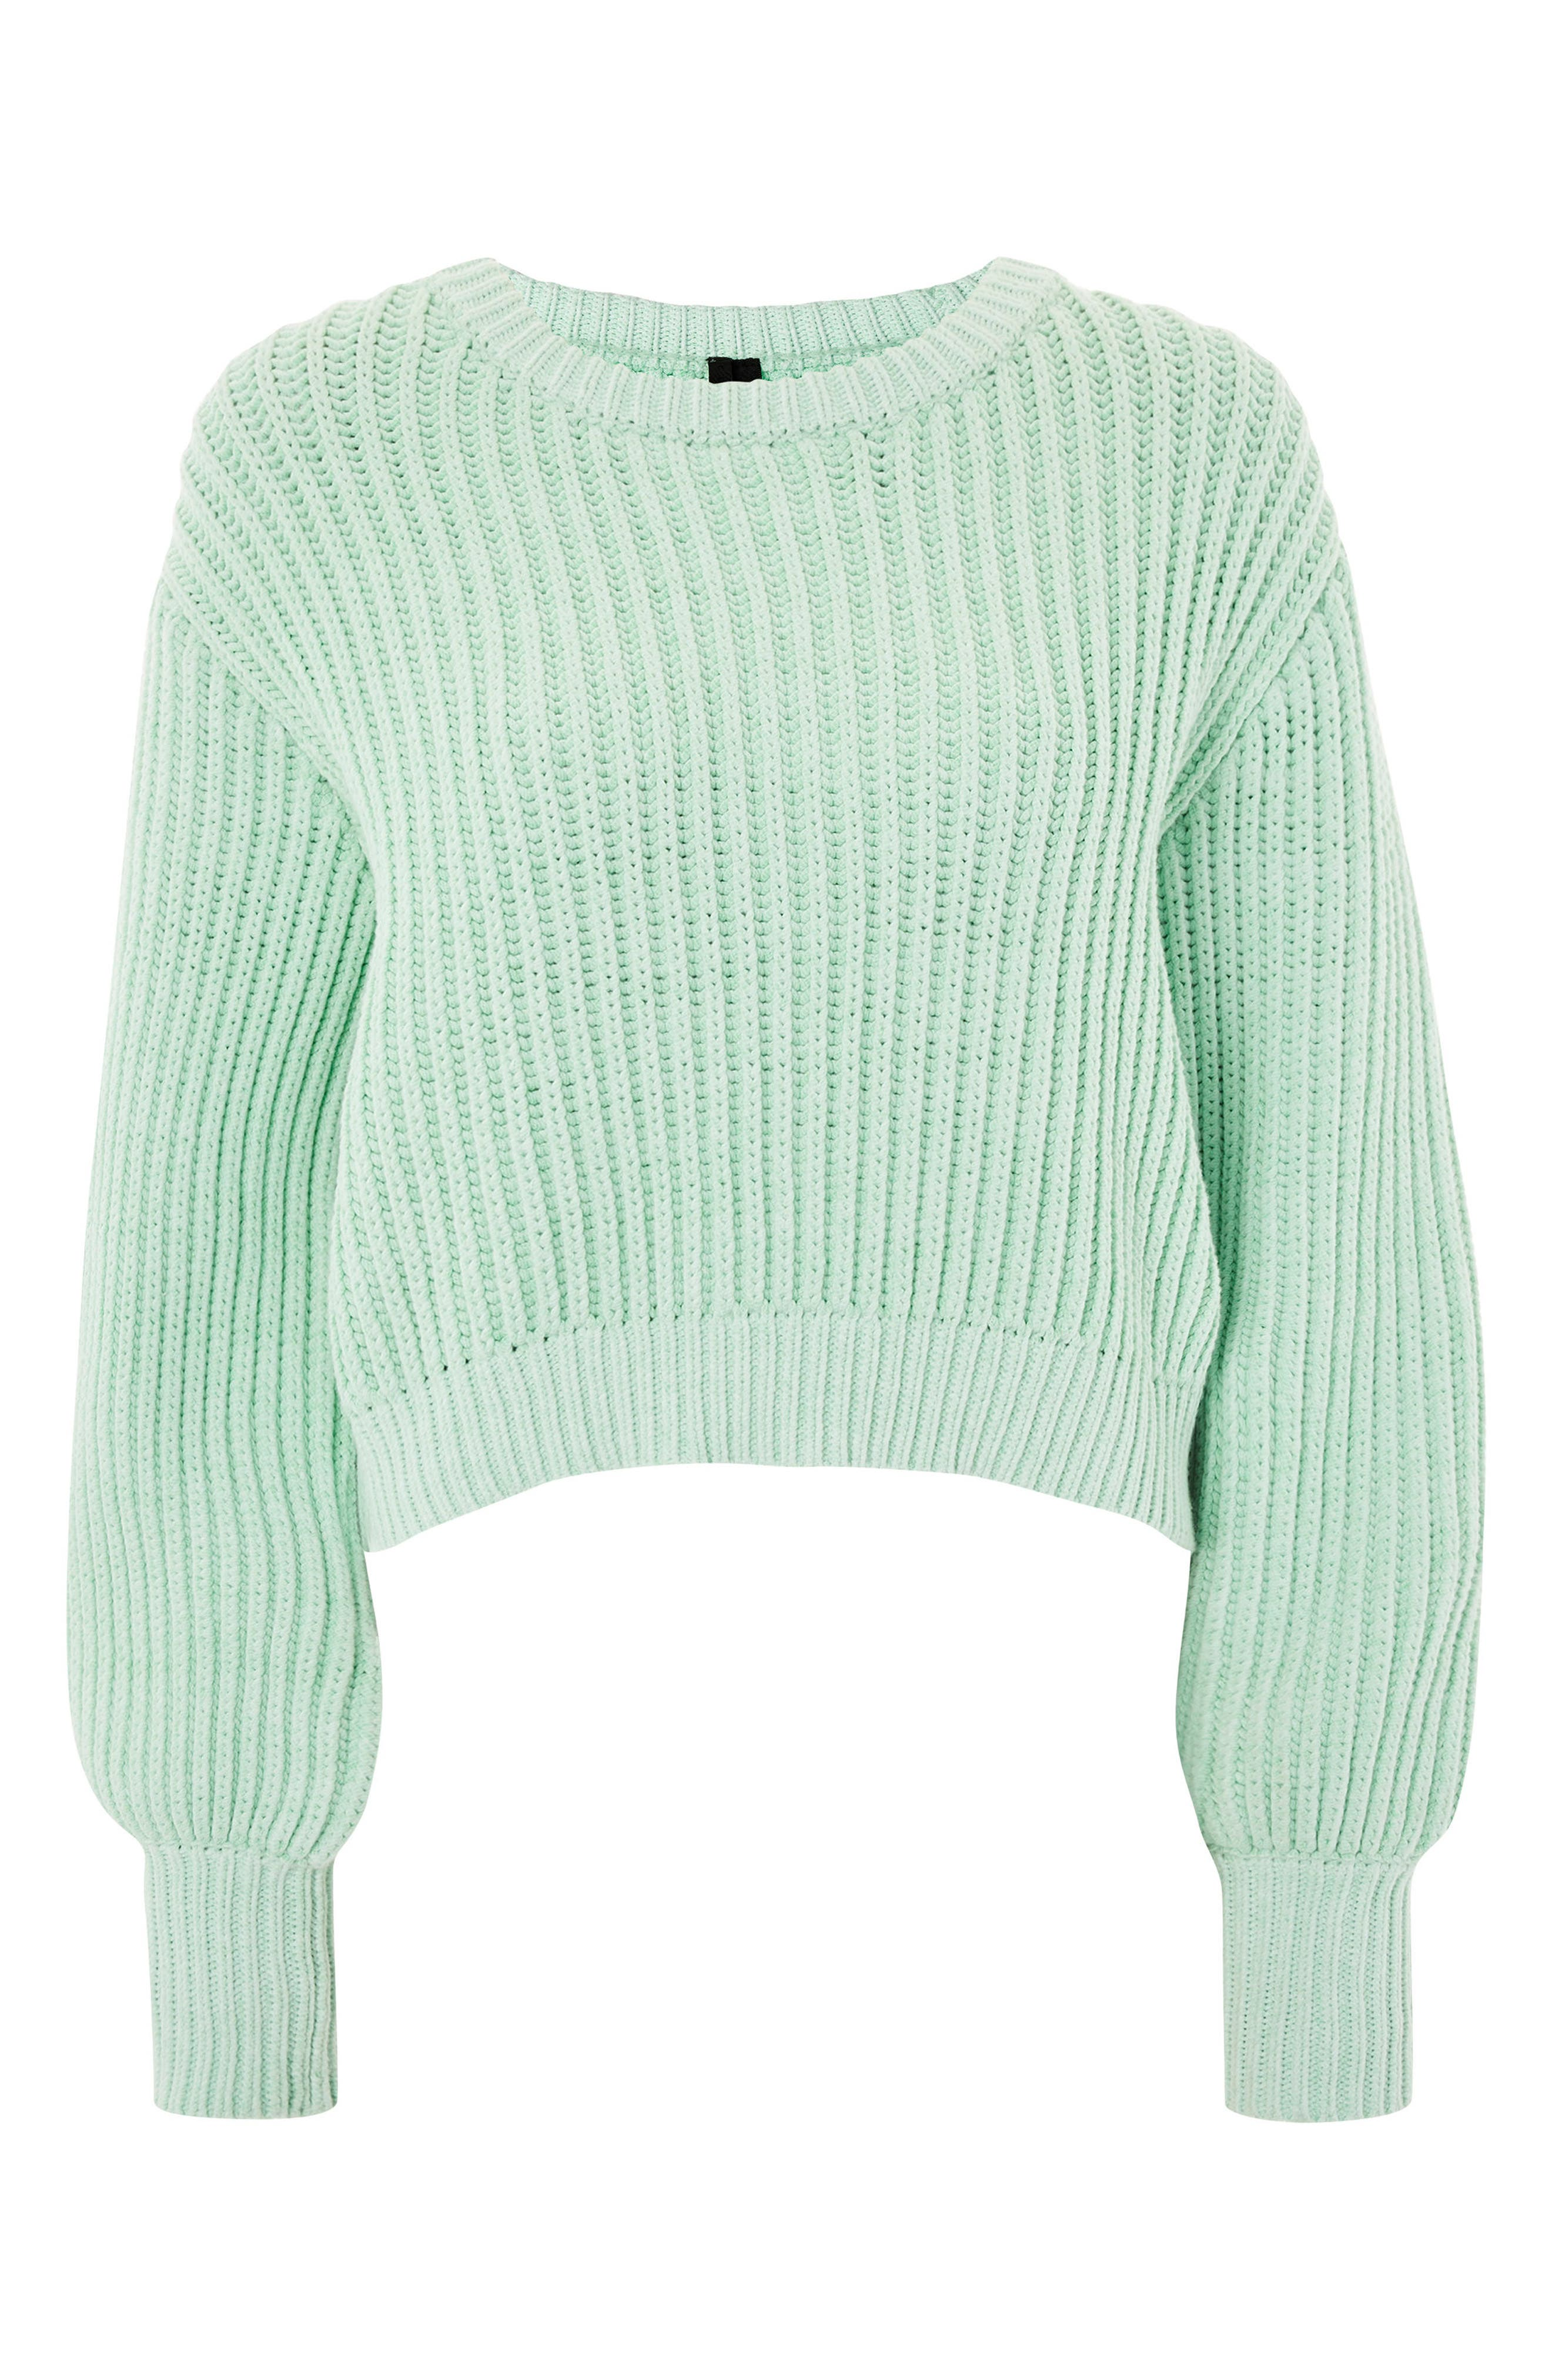 Fisherman Crewneck Sweater,                             Main thumbnail 1, color,                             Light Green